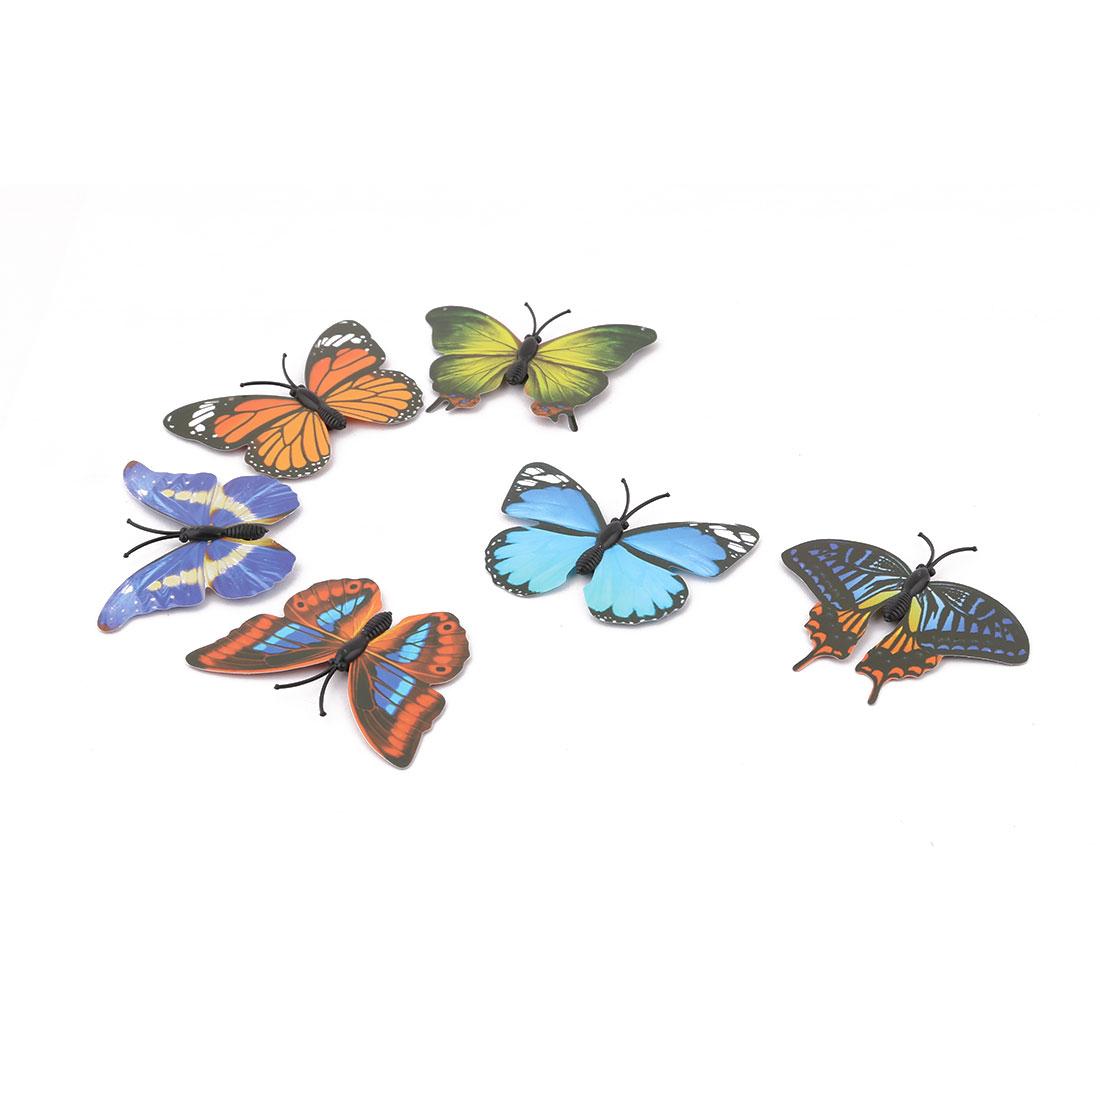 Household Fridge Plastic Whiteboard Bulletin Board Butterfly Design Magnet Colorful 6pcs